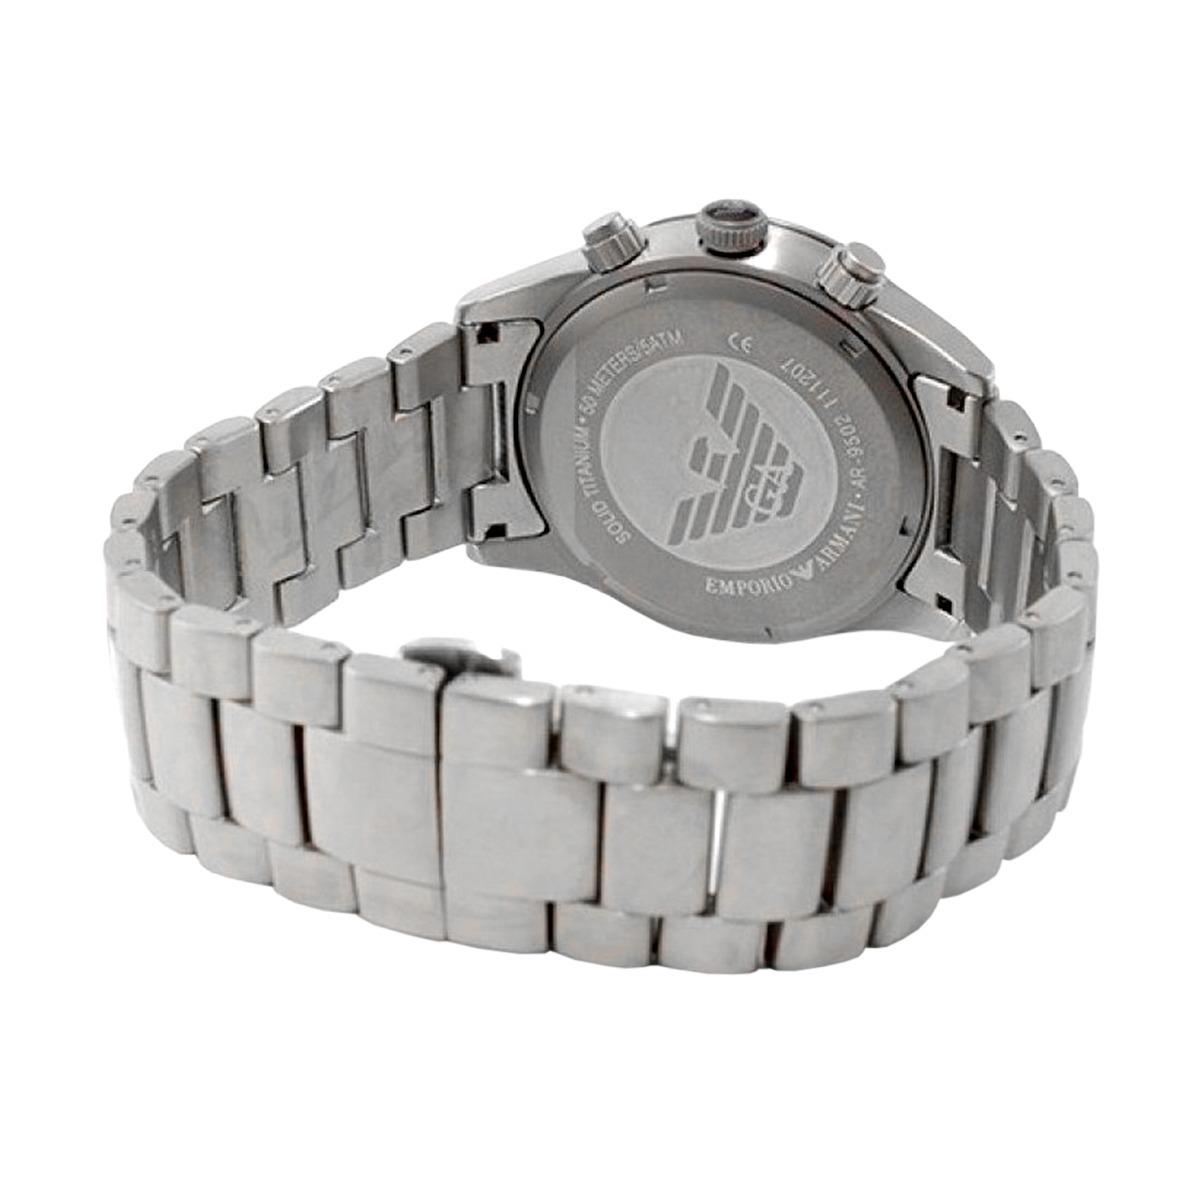 44dd834e8a85 reloj emporio armani ar9502 para hombre nuevo original. Cargando zoom.